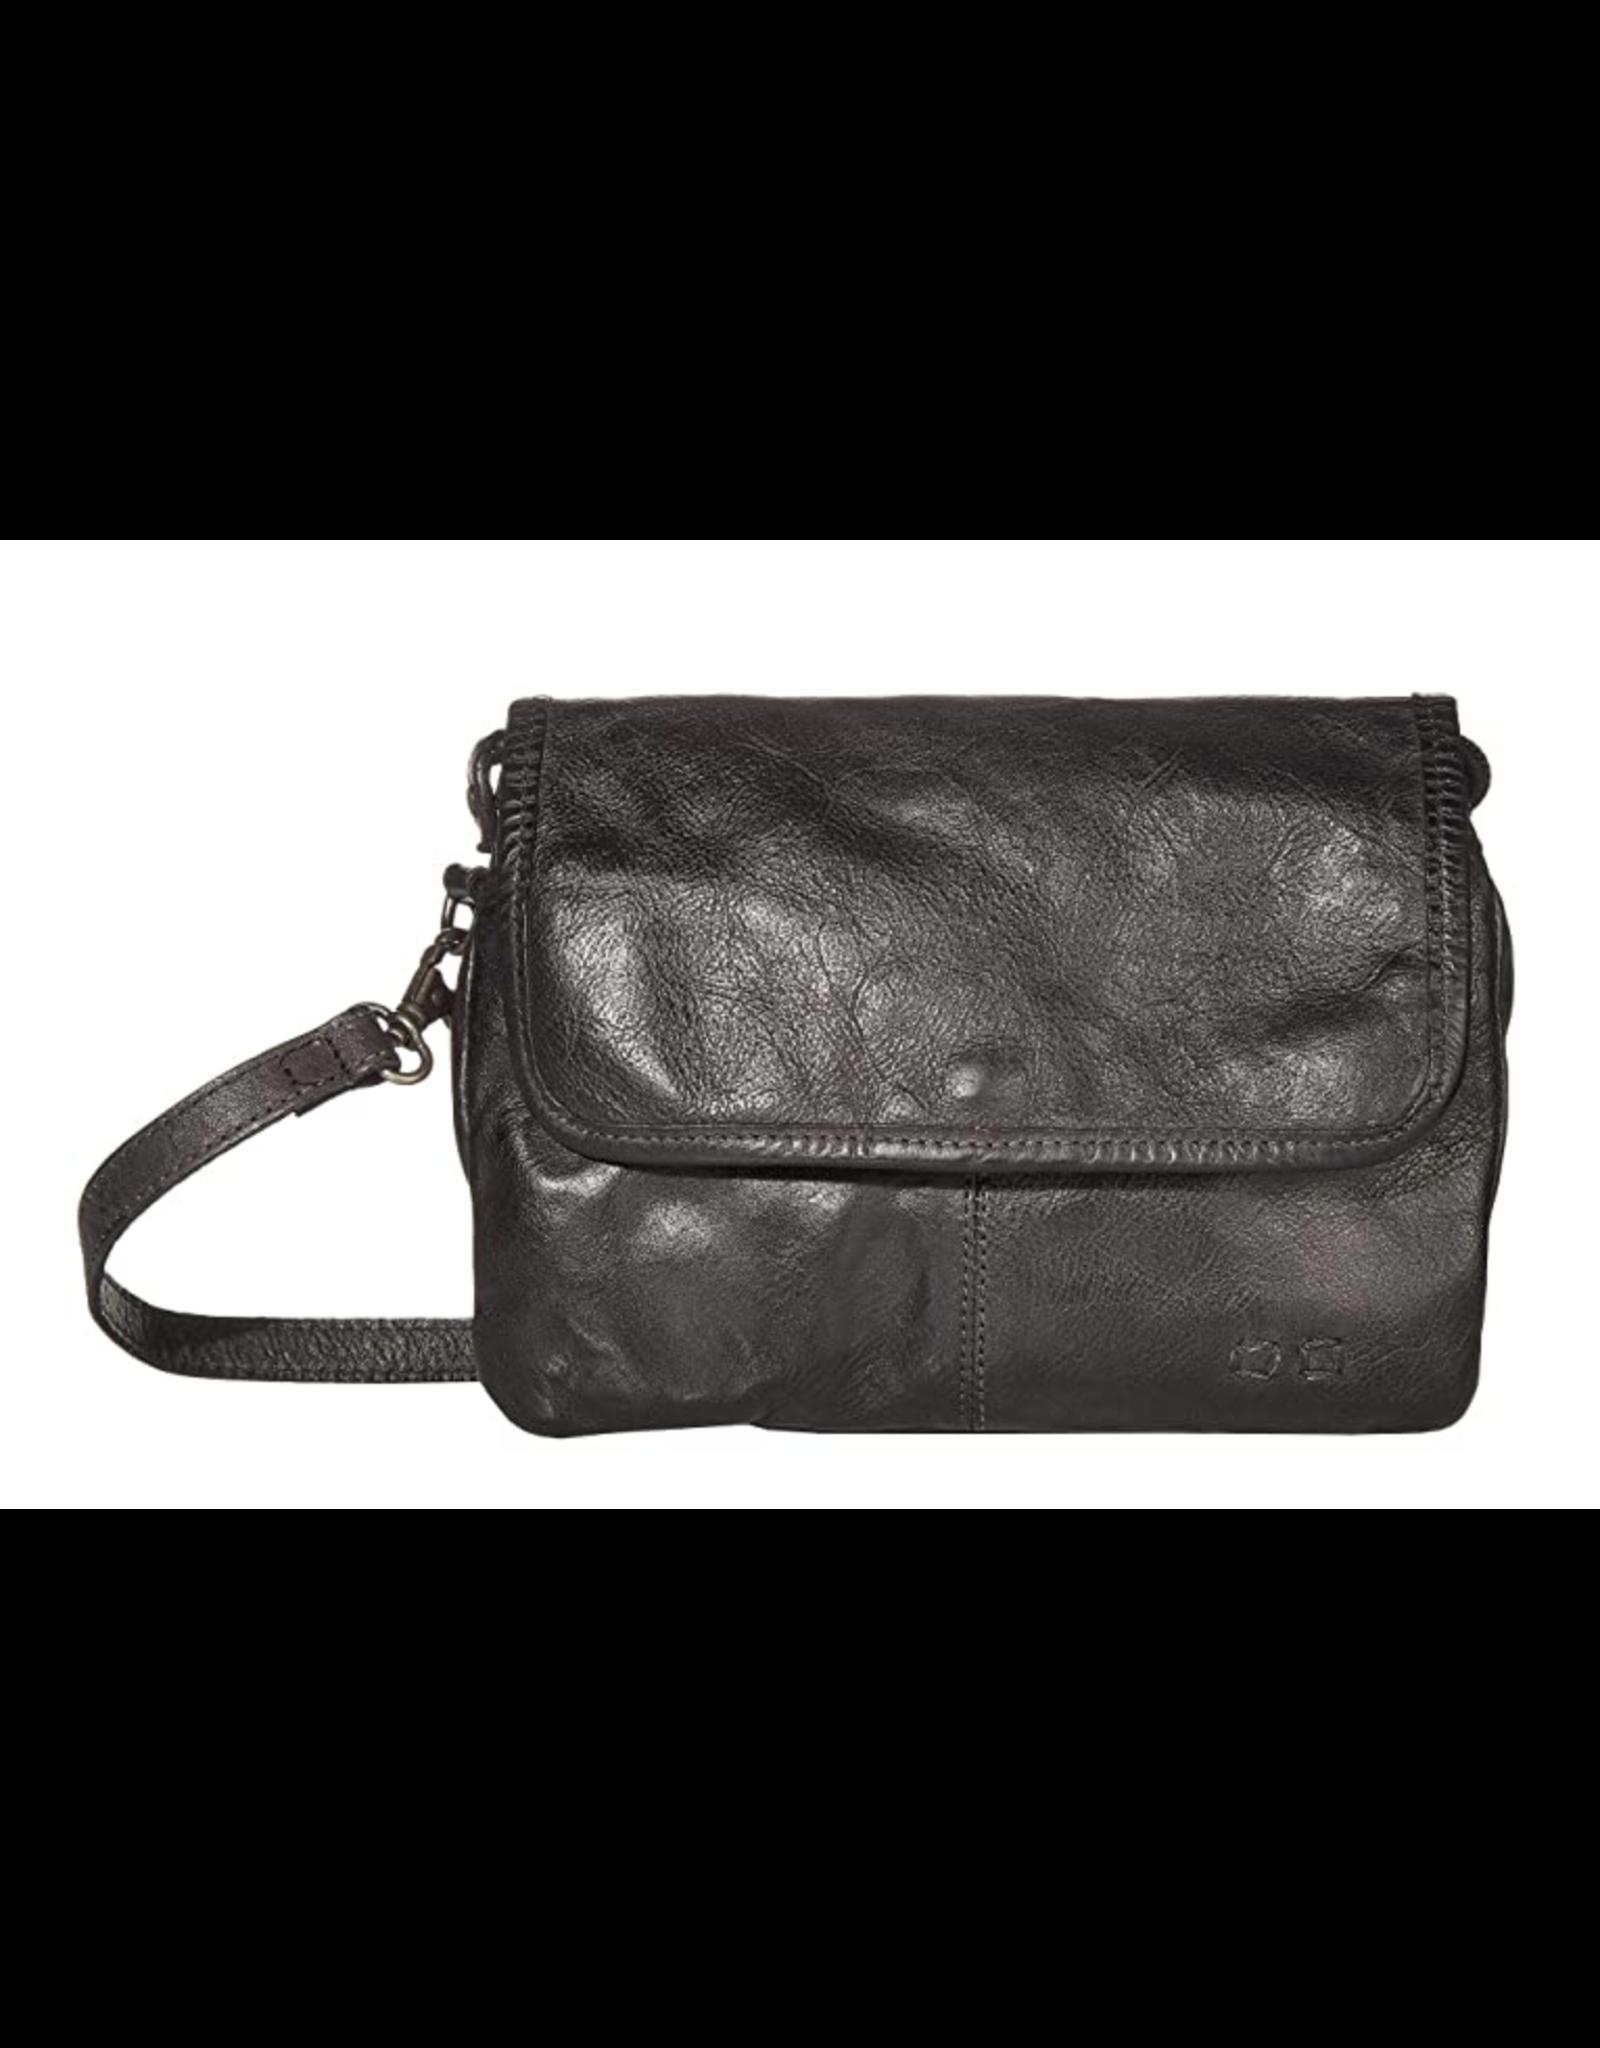 Bed Stu Ziggy Handbag